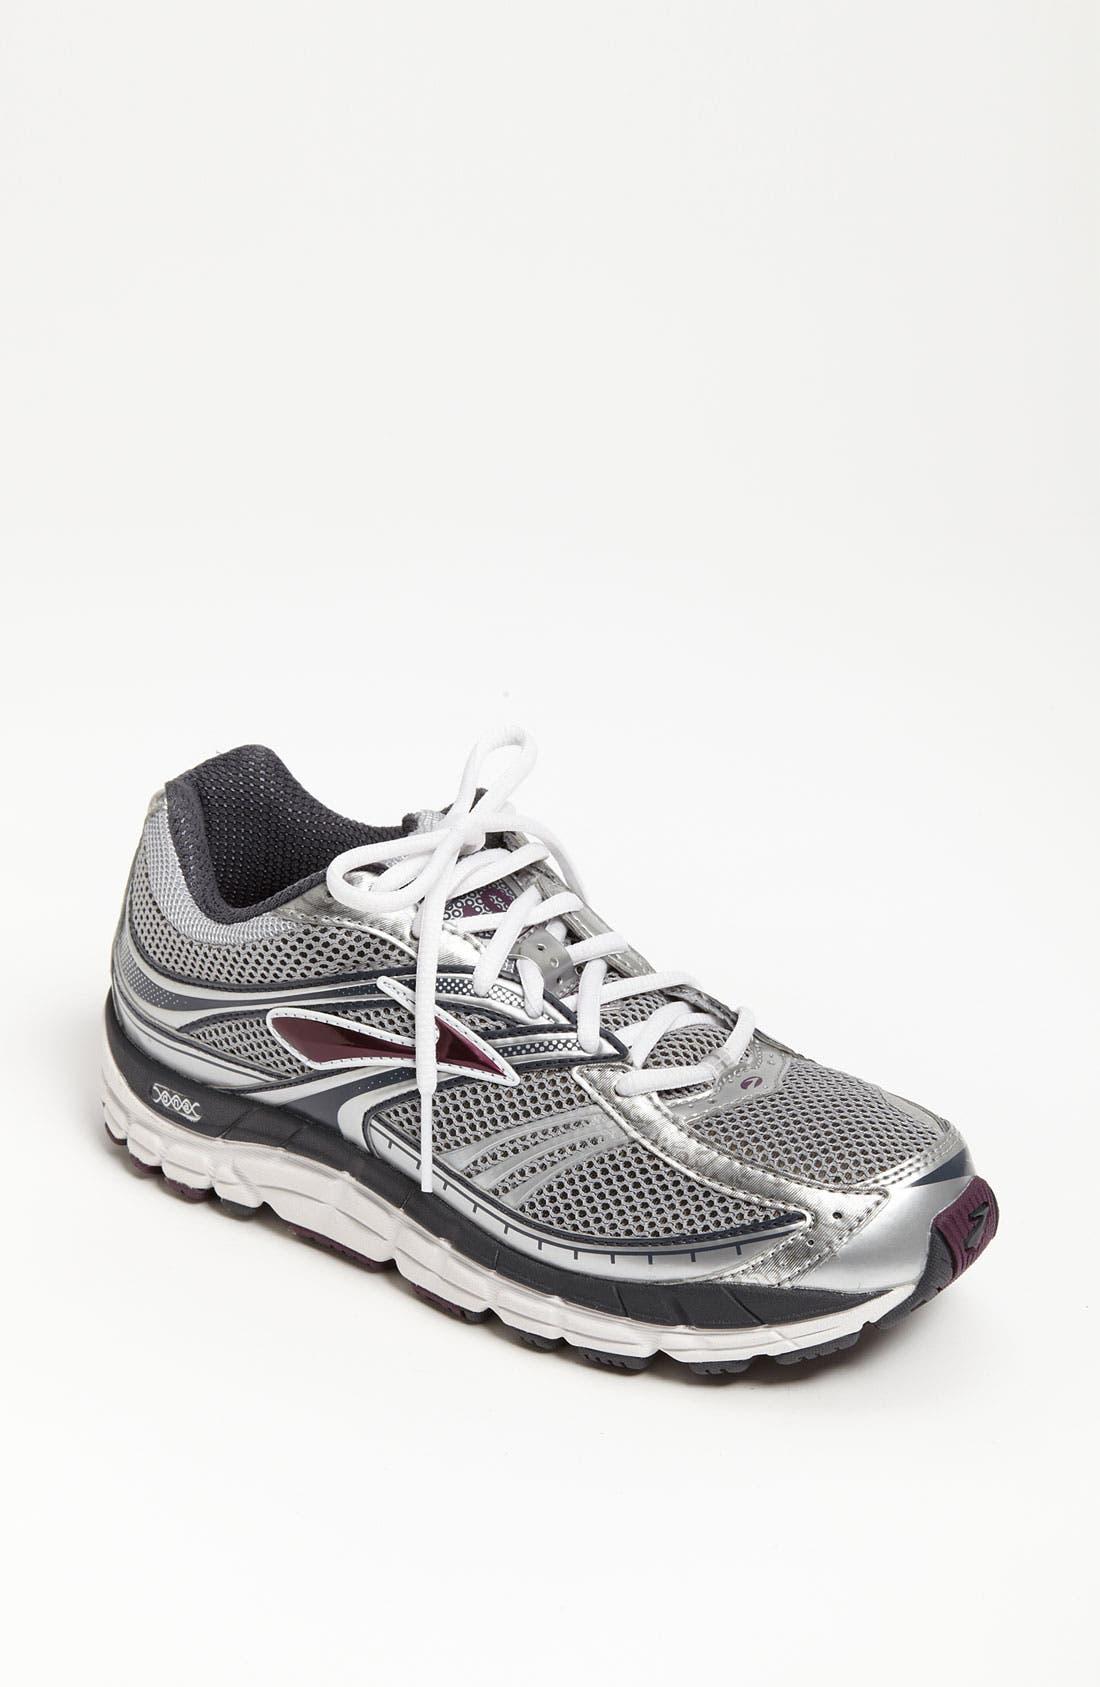 Main Image - Brooks 'Addiction 10' Running Shoe (Women)